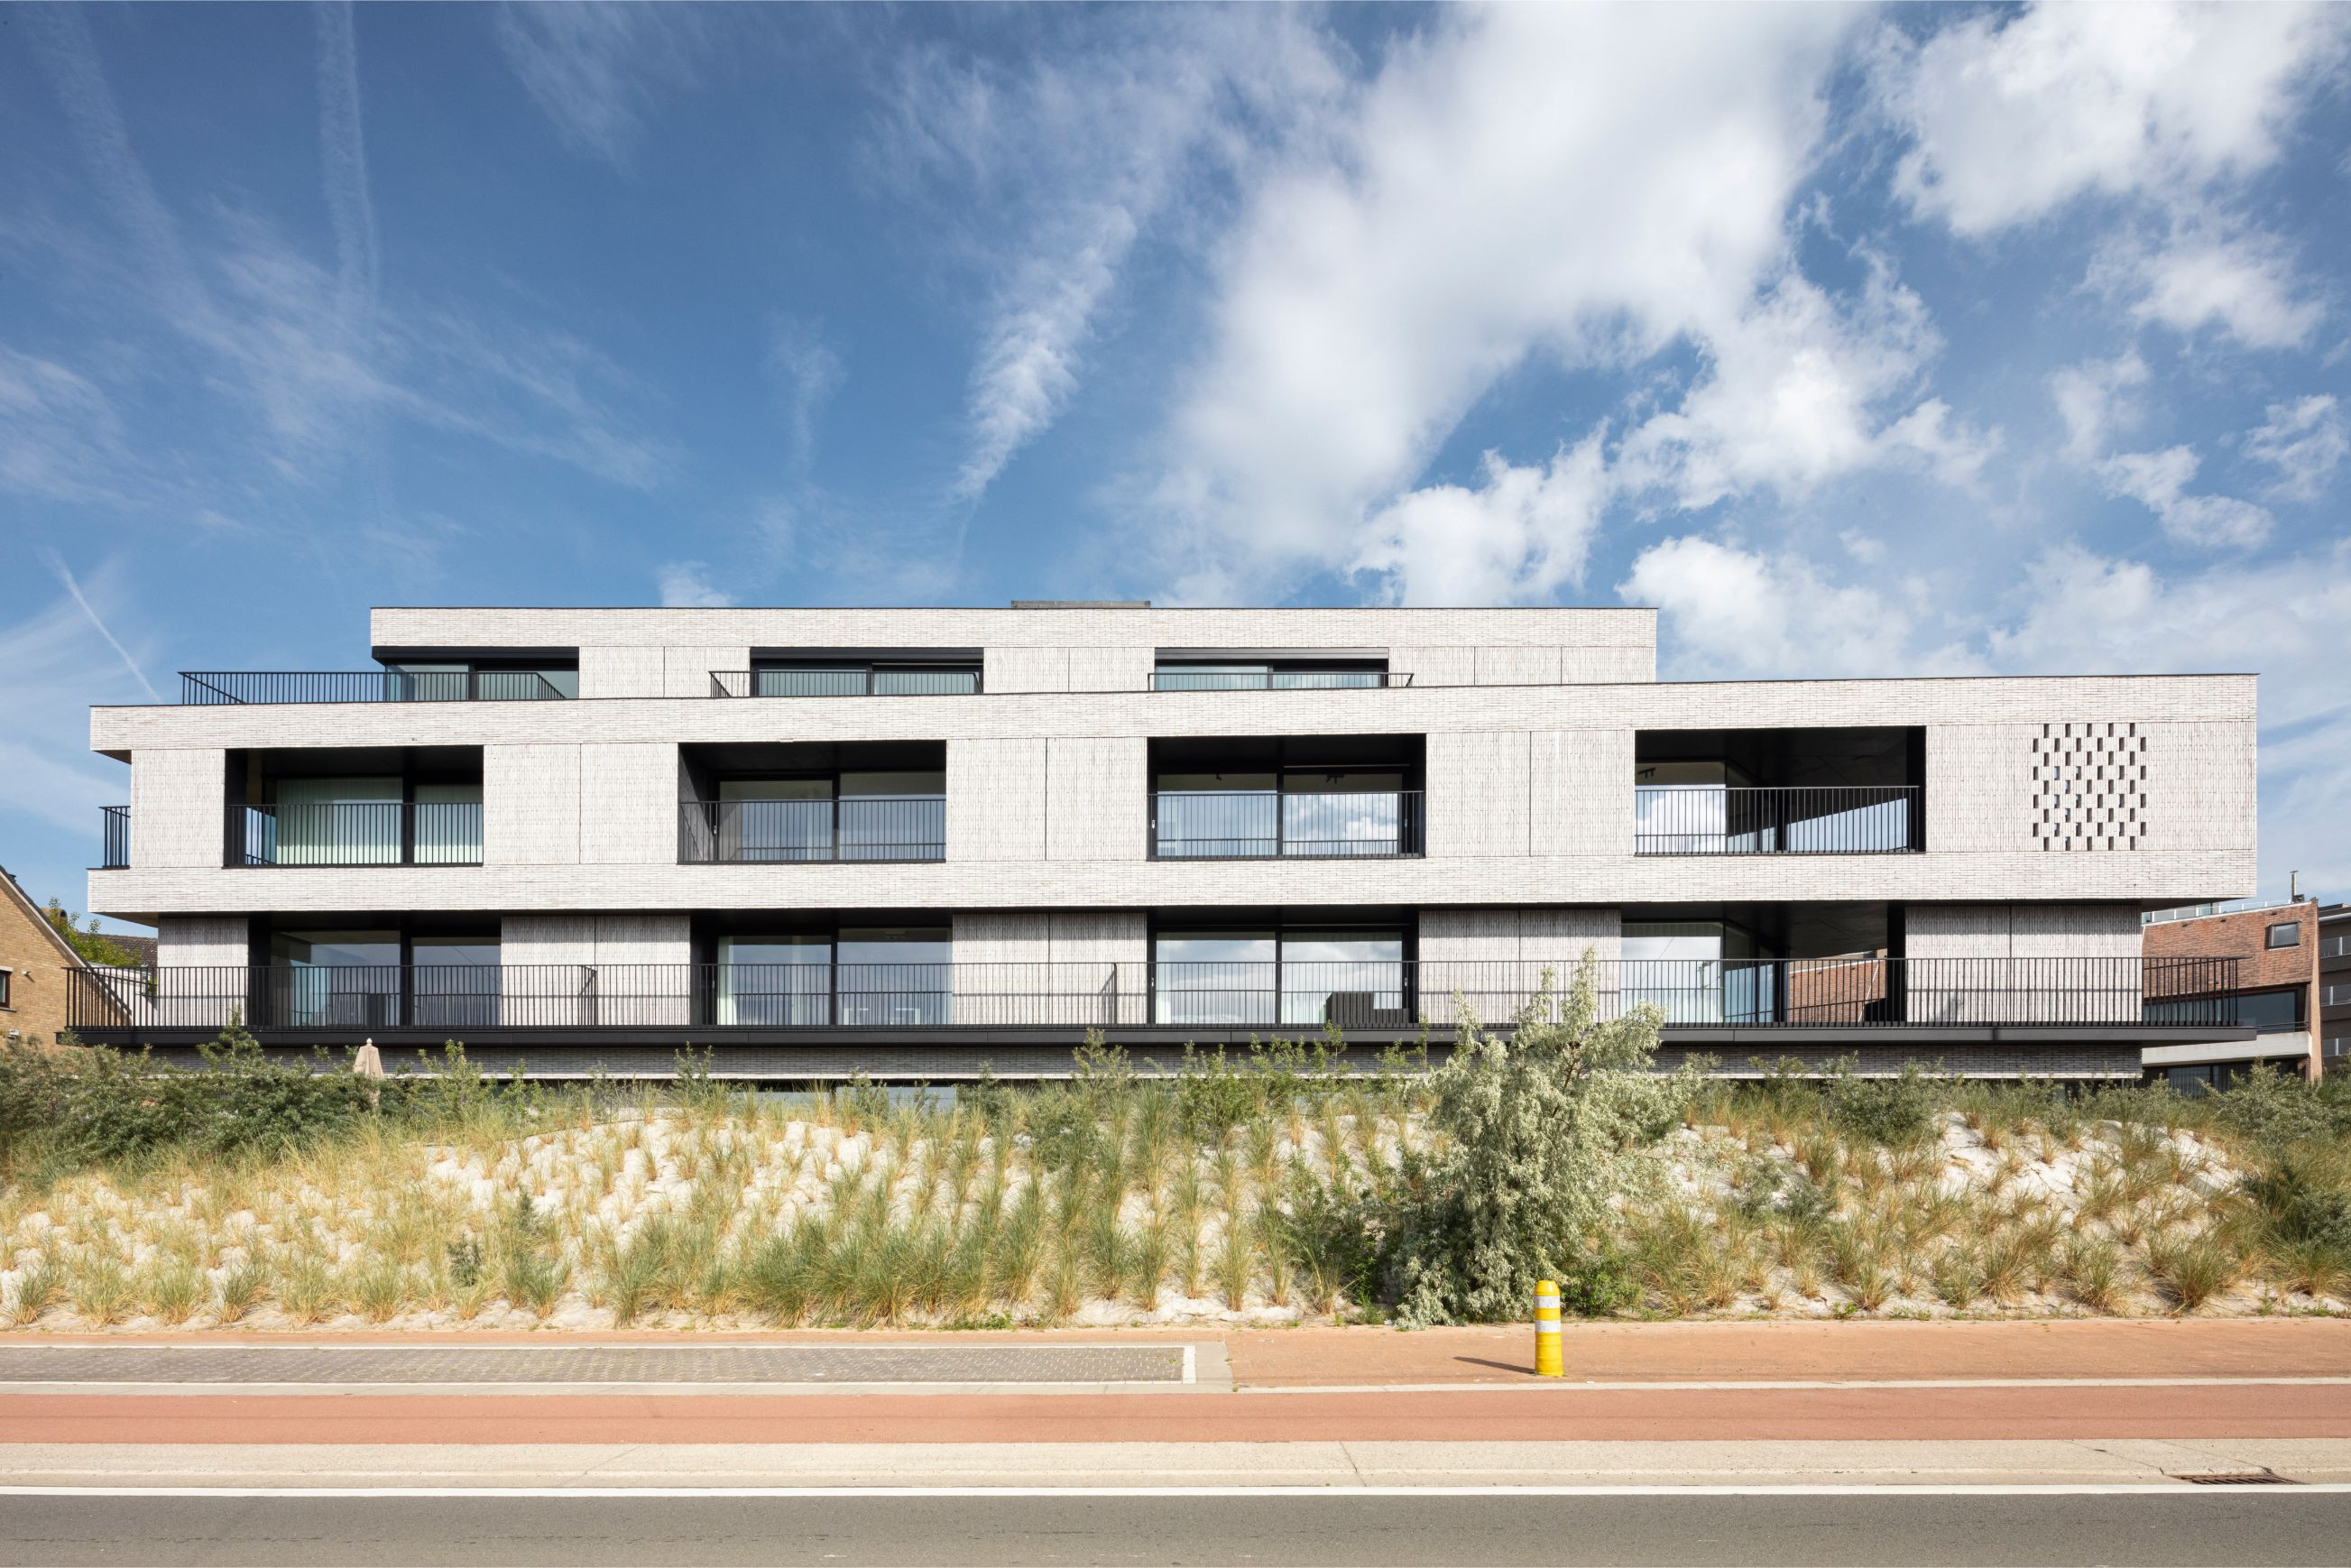 Pierre Paulin - Rietveldprojects - Sint-Idesbald - Tvdv11.jpg